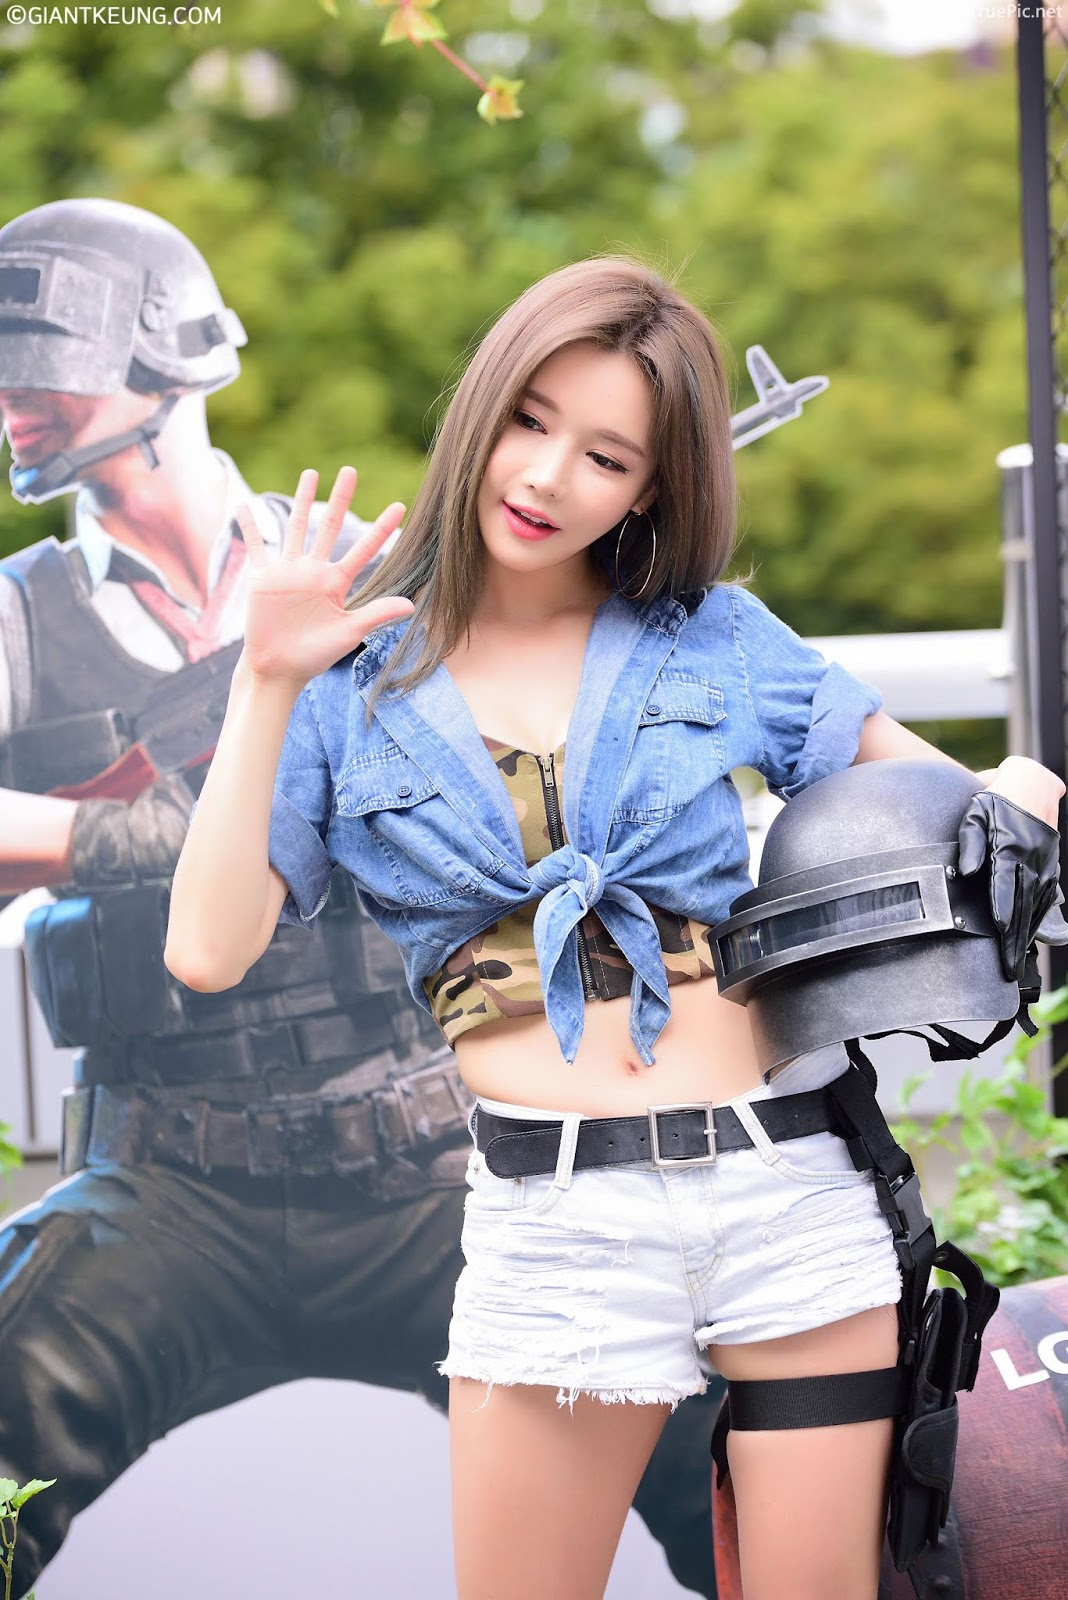 Korean Racing Model - Han Ga Eun - LG Ultragear Festival- Picture 5